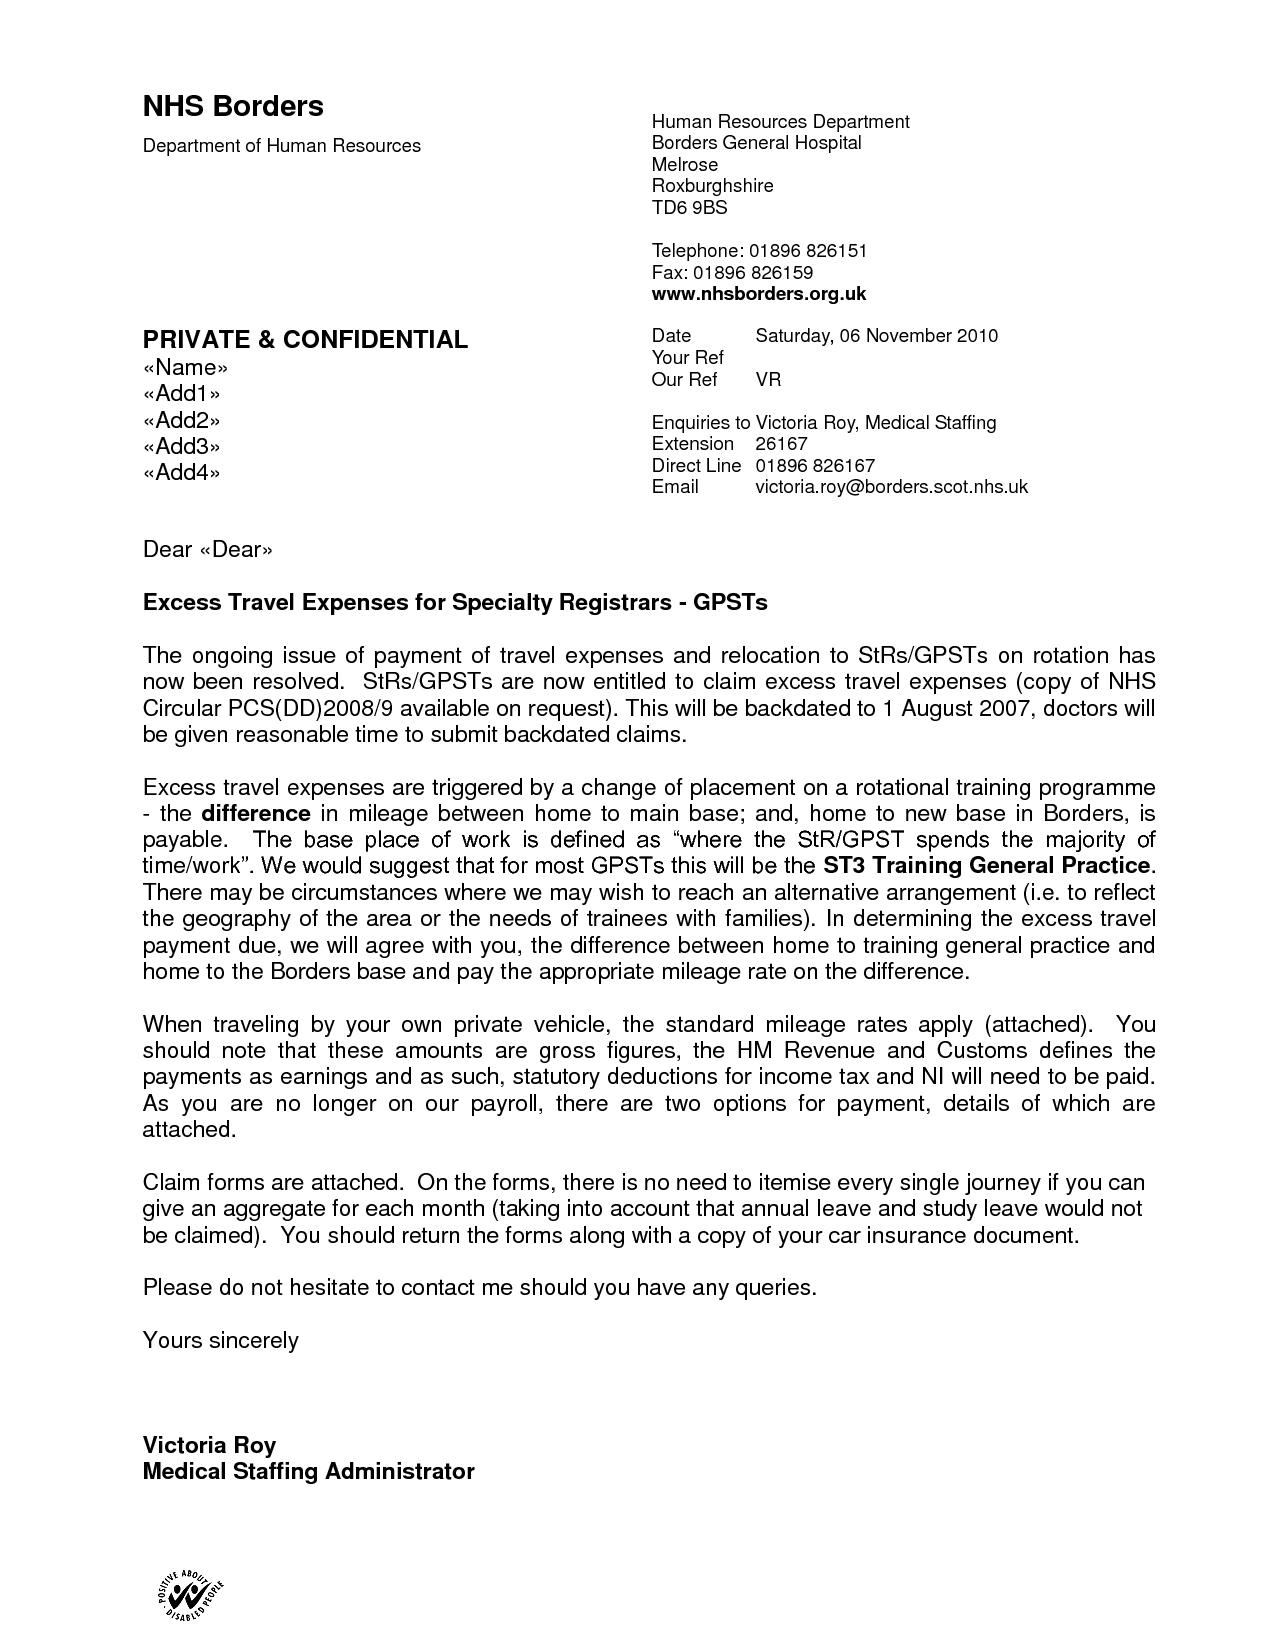 recommendation letter for nhs